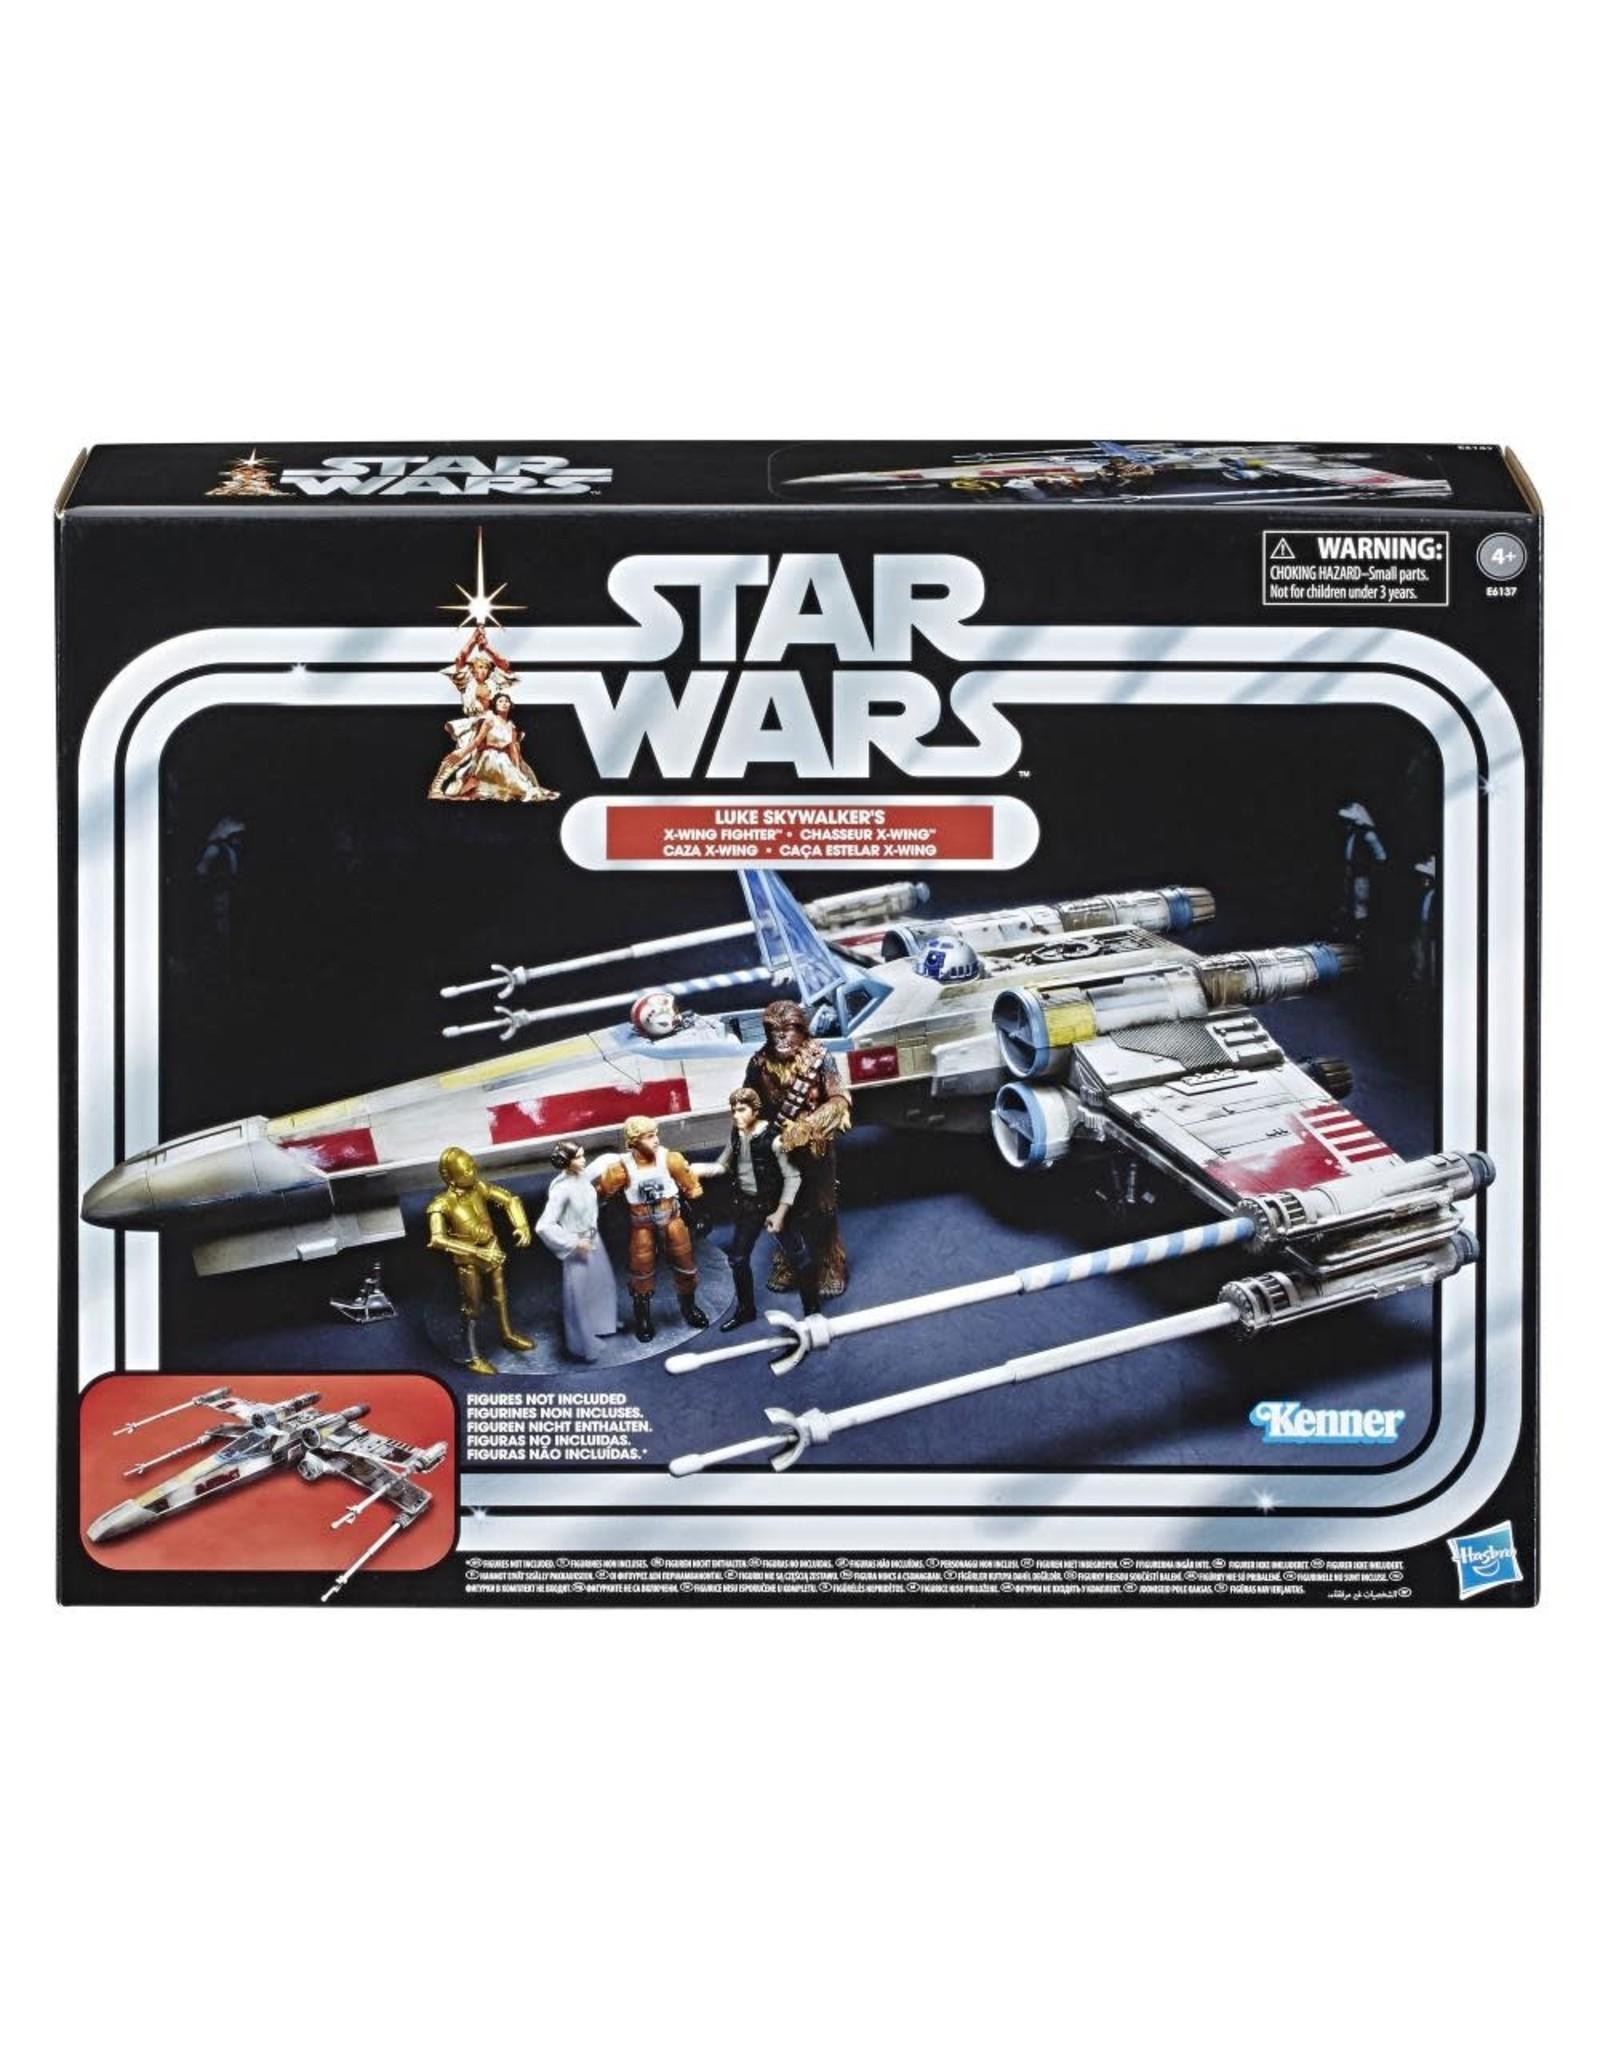 Hasbro Star Wars Vintage Collection Luke Skywalker Red 5 X-Wing